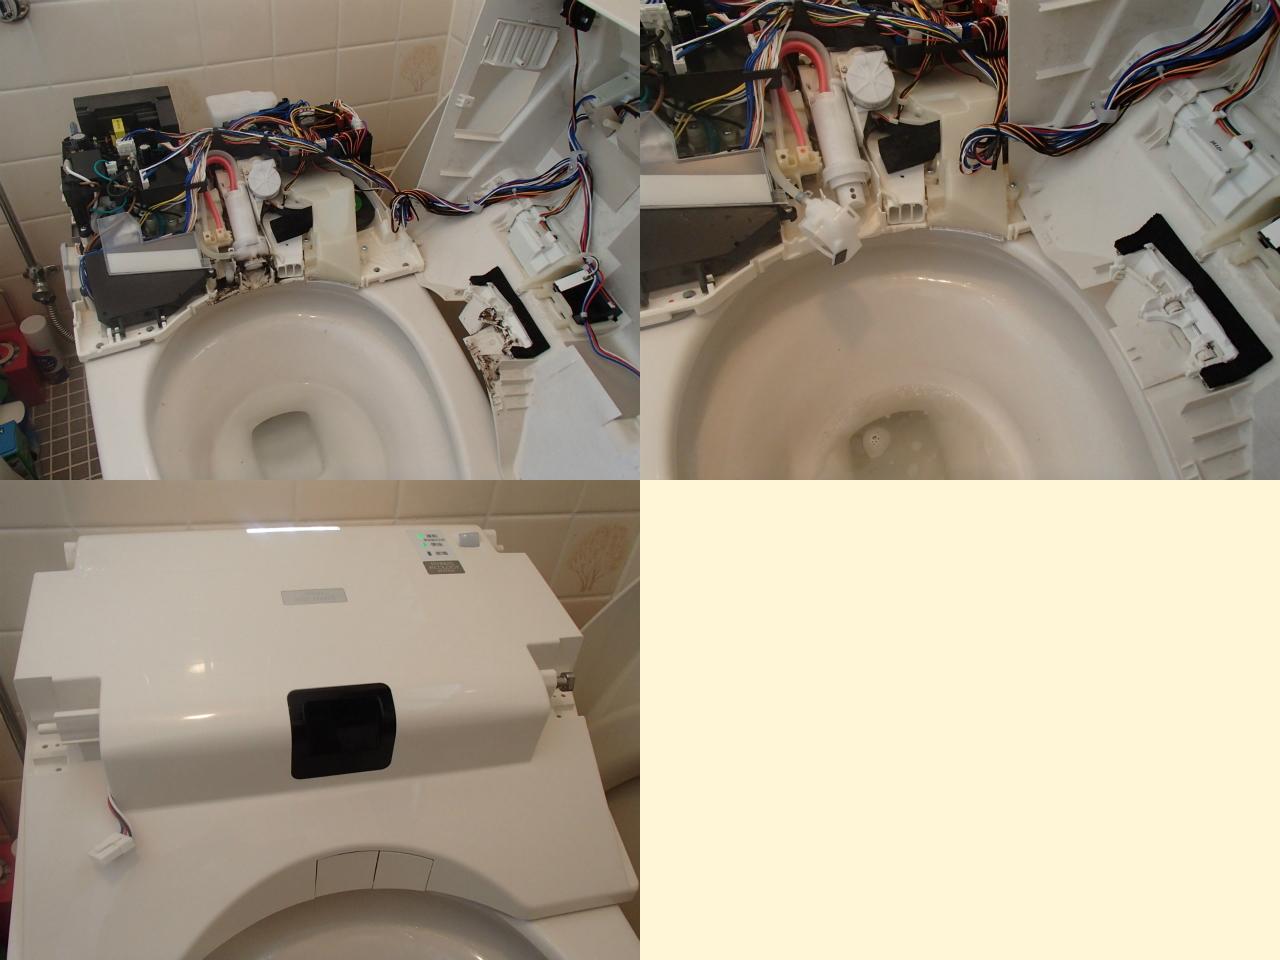 http://ajras.net/images/121119-toilet.jpg